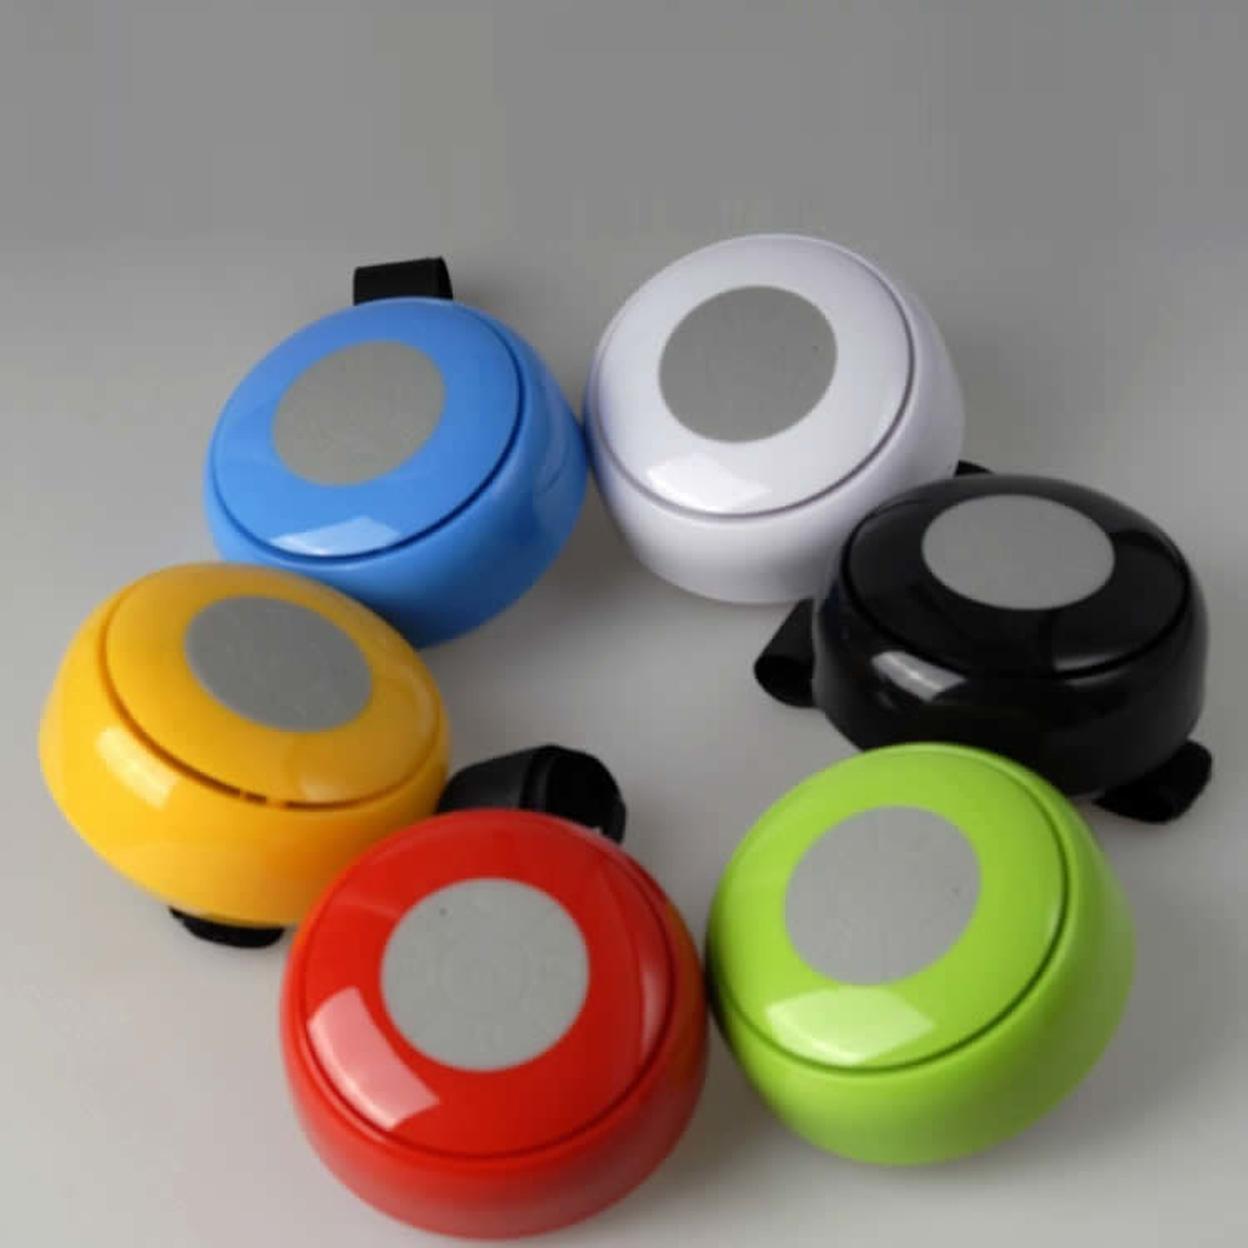 Waterproof Bluetooth Bike-Mounted Sports Speaker 55060f794c3d6fac678b597a